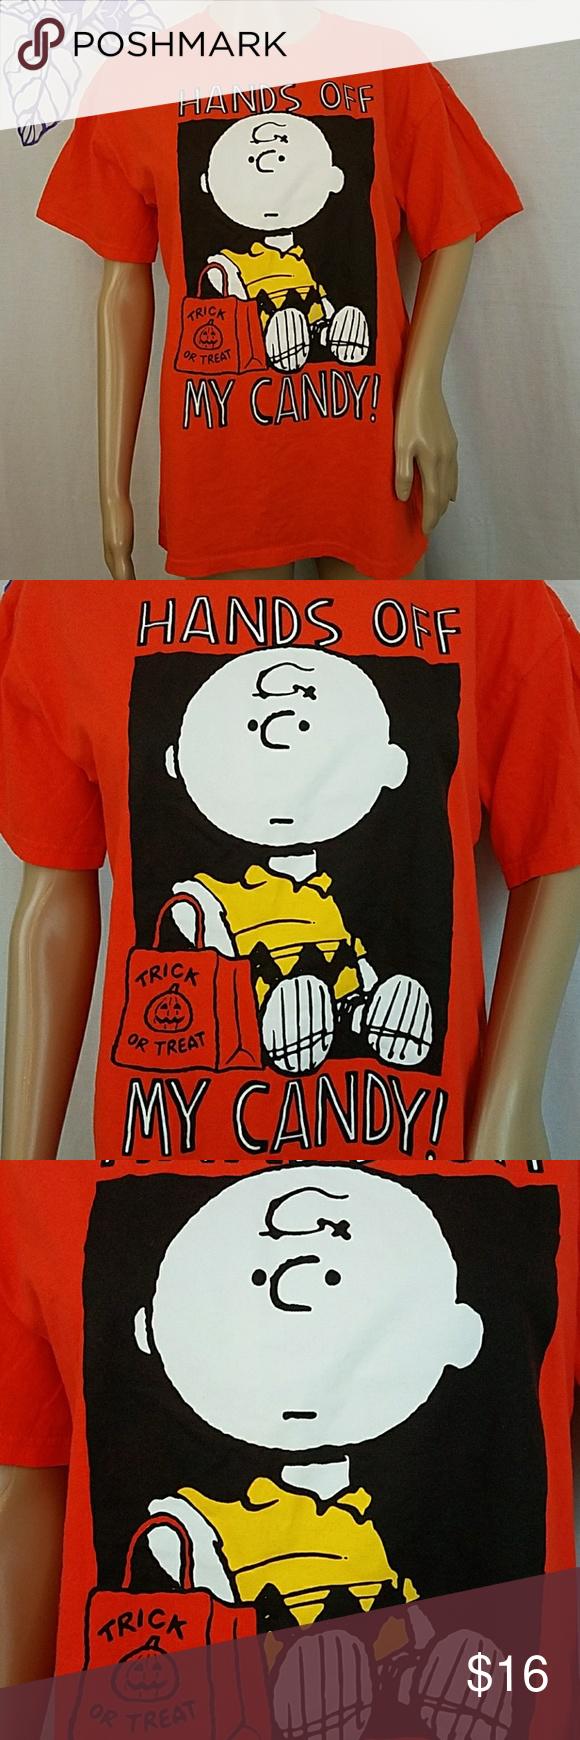 5 4 30 peanuts charlie brown halloween t-shirt0082 | my posh picks